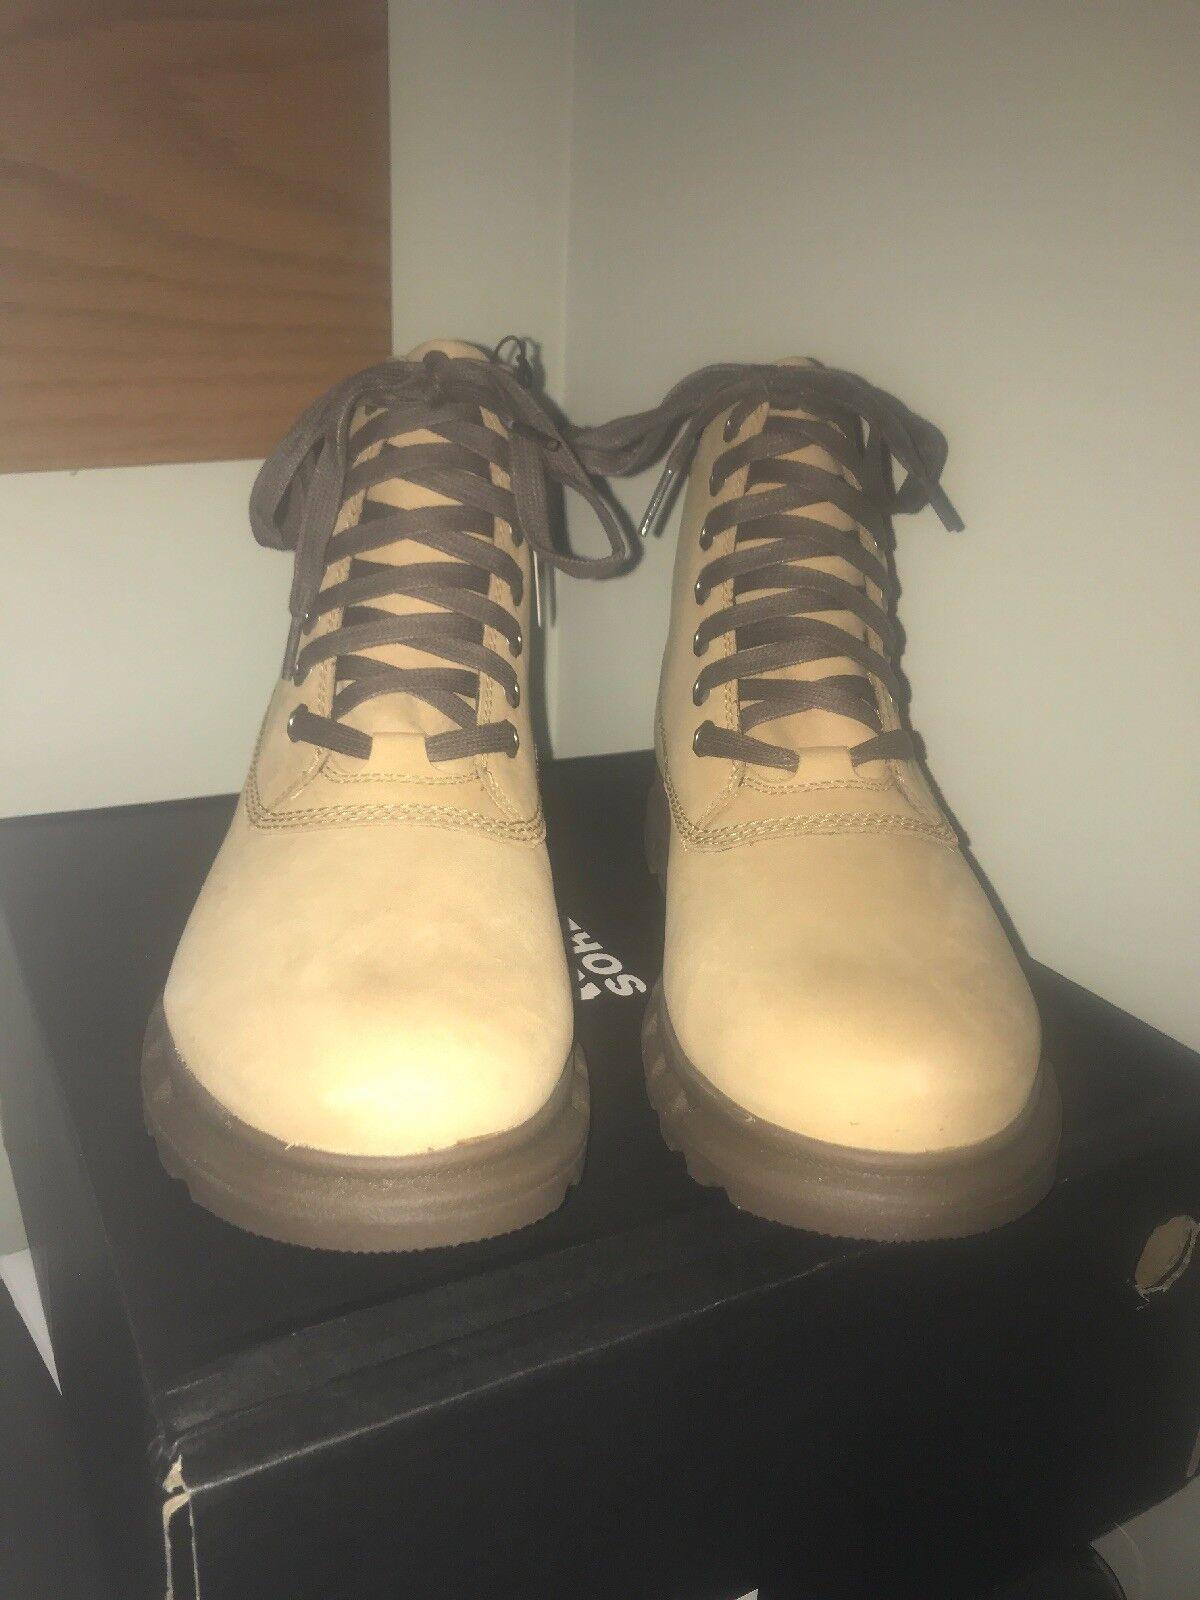 NIB Sorel Uomo Portzman Lace stivali - Buff / Hawk - size 8 - retail  160